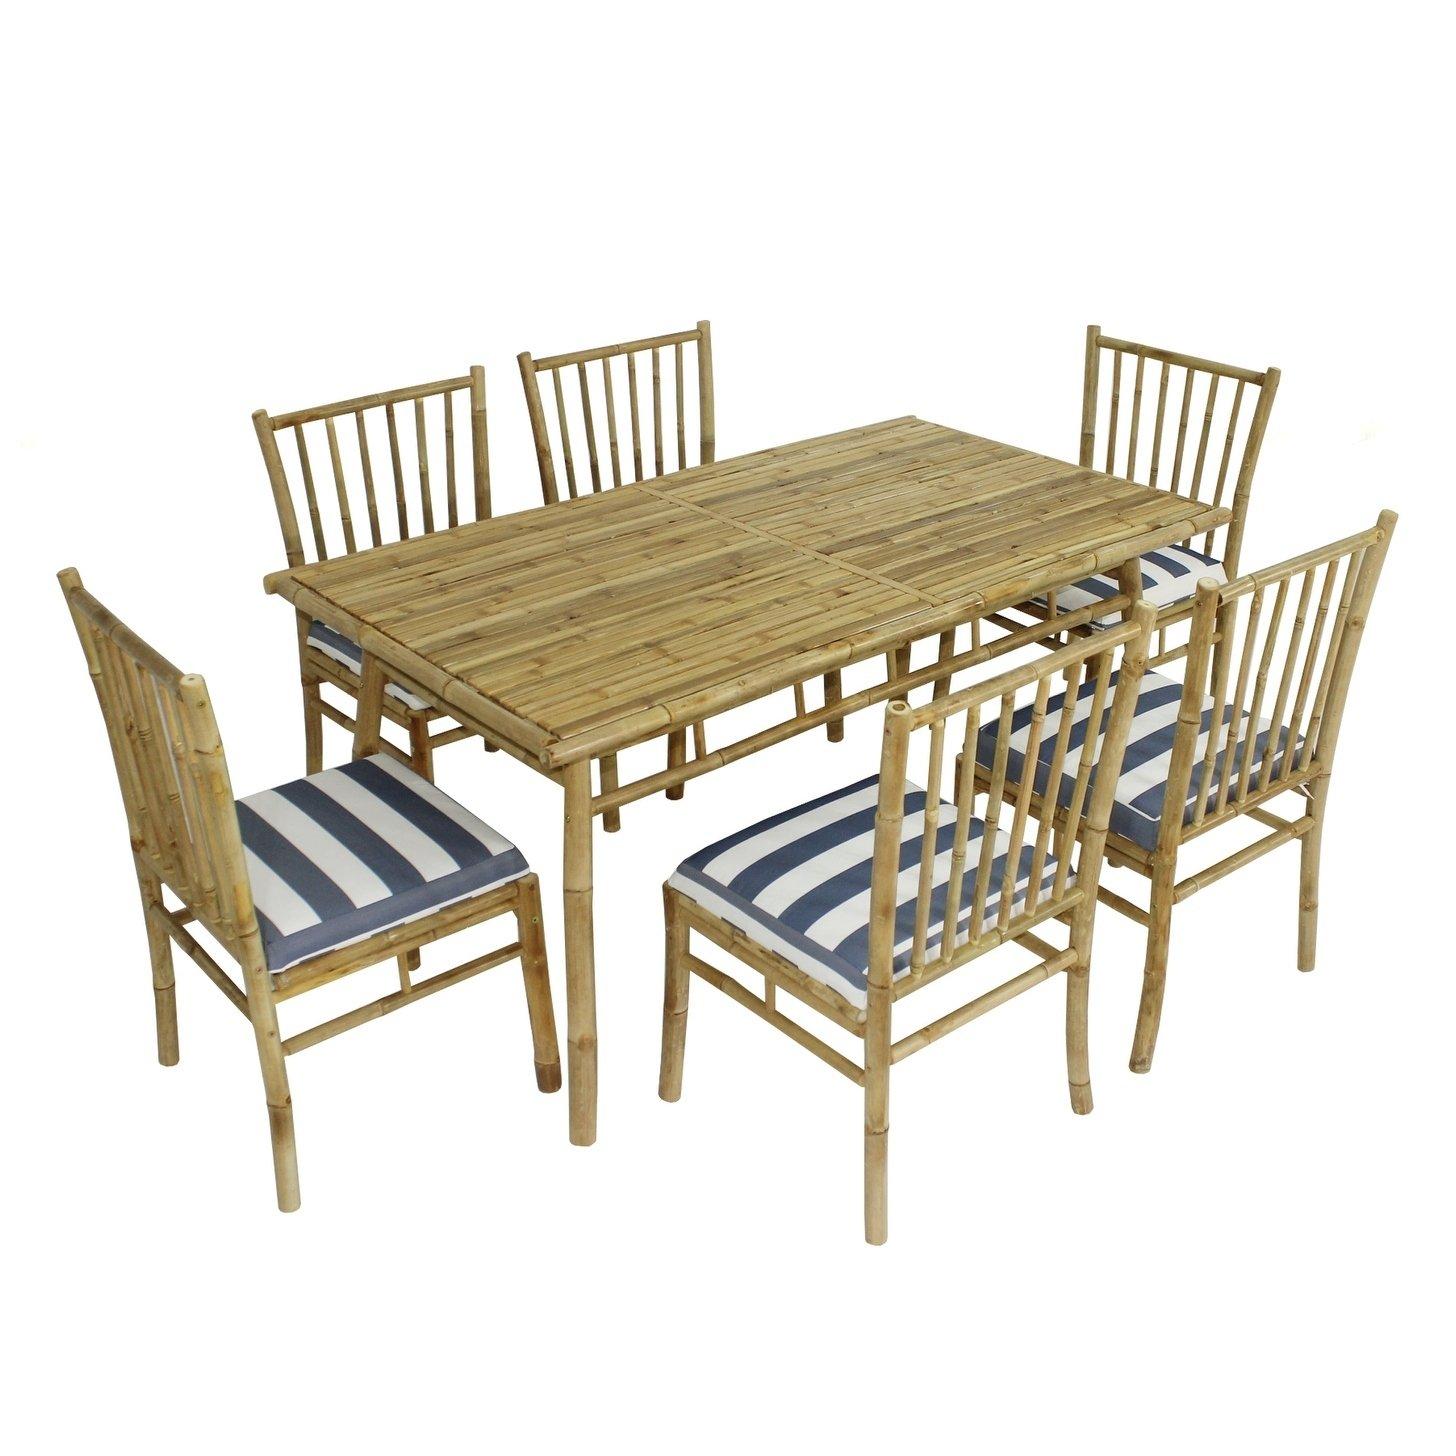 Fantastic Dining Set Of 6 White Blue Stripes Bamboo Chairs Rectangular Inzonedesignstudio Interior Chair Design Inzonedesignstudiocom